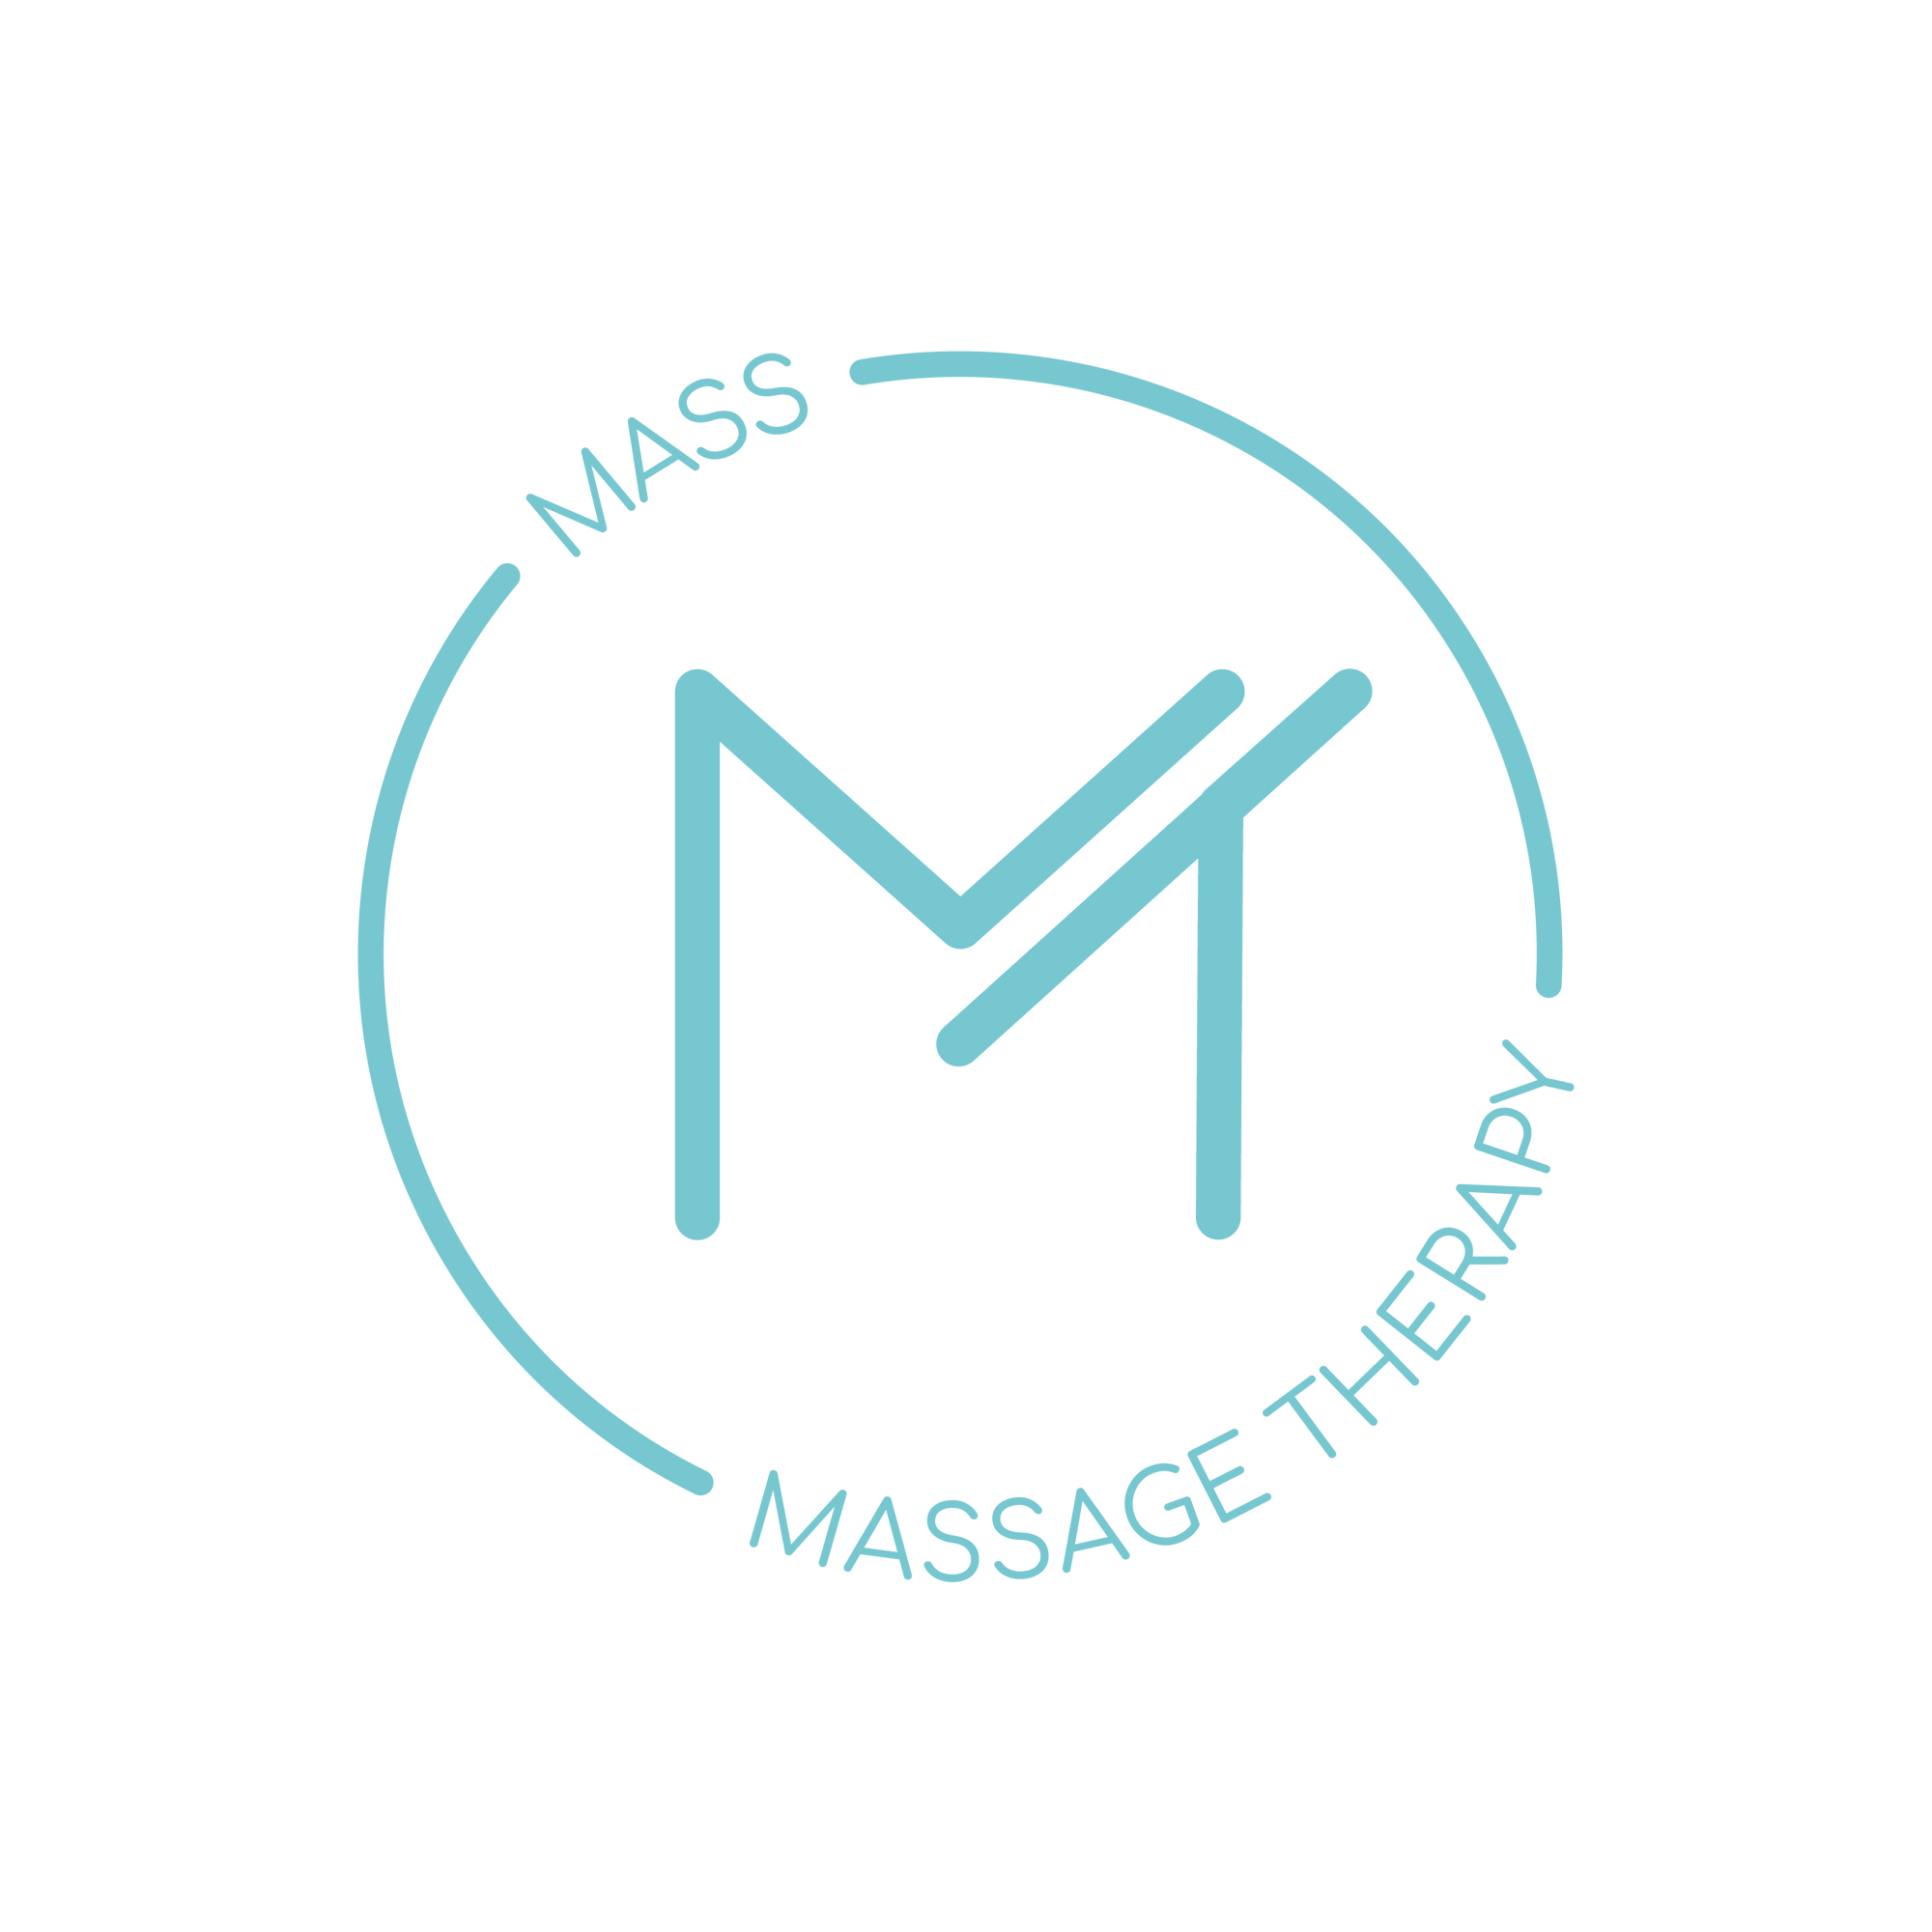 logo-Mockup-made-marketing-portfolio-Massage